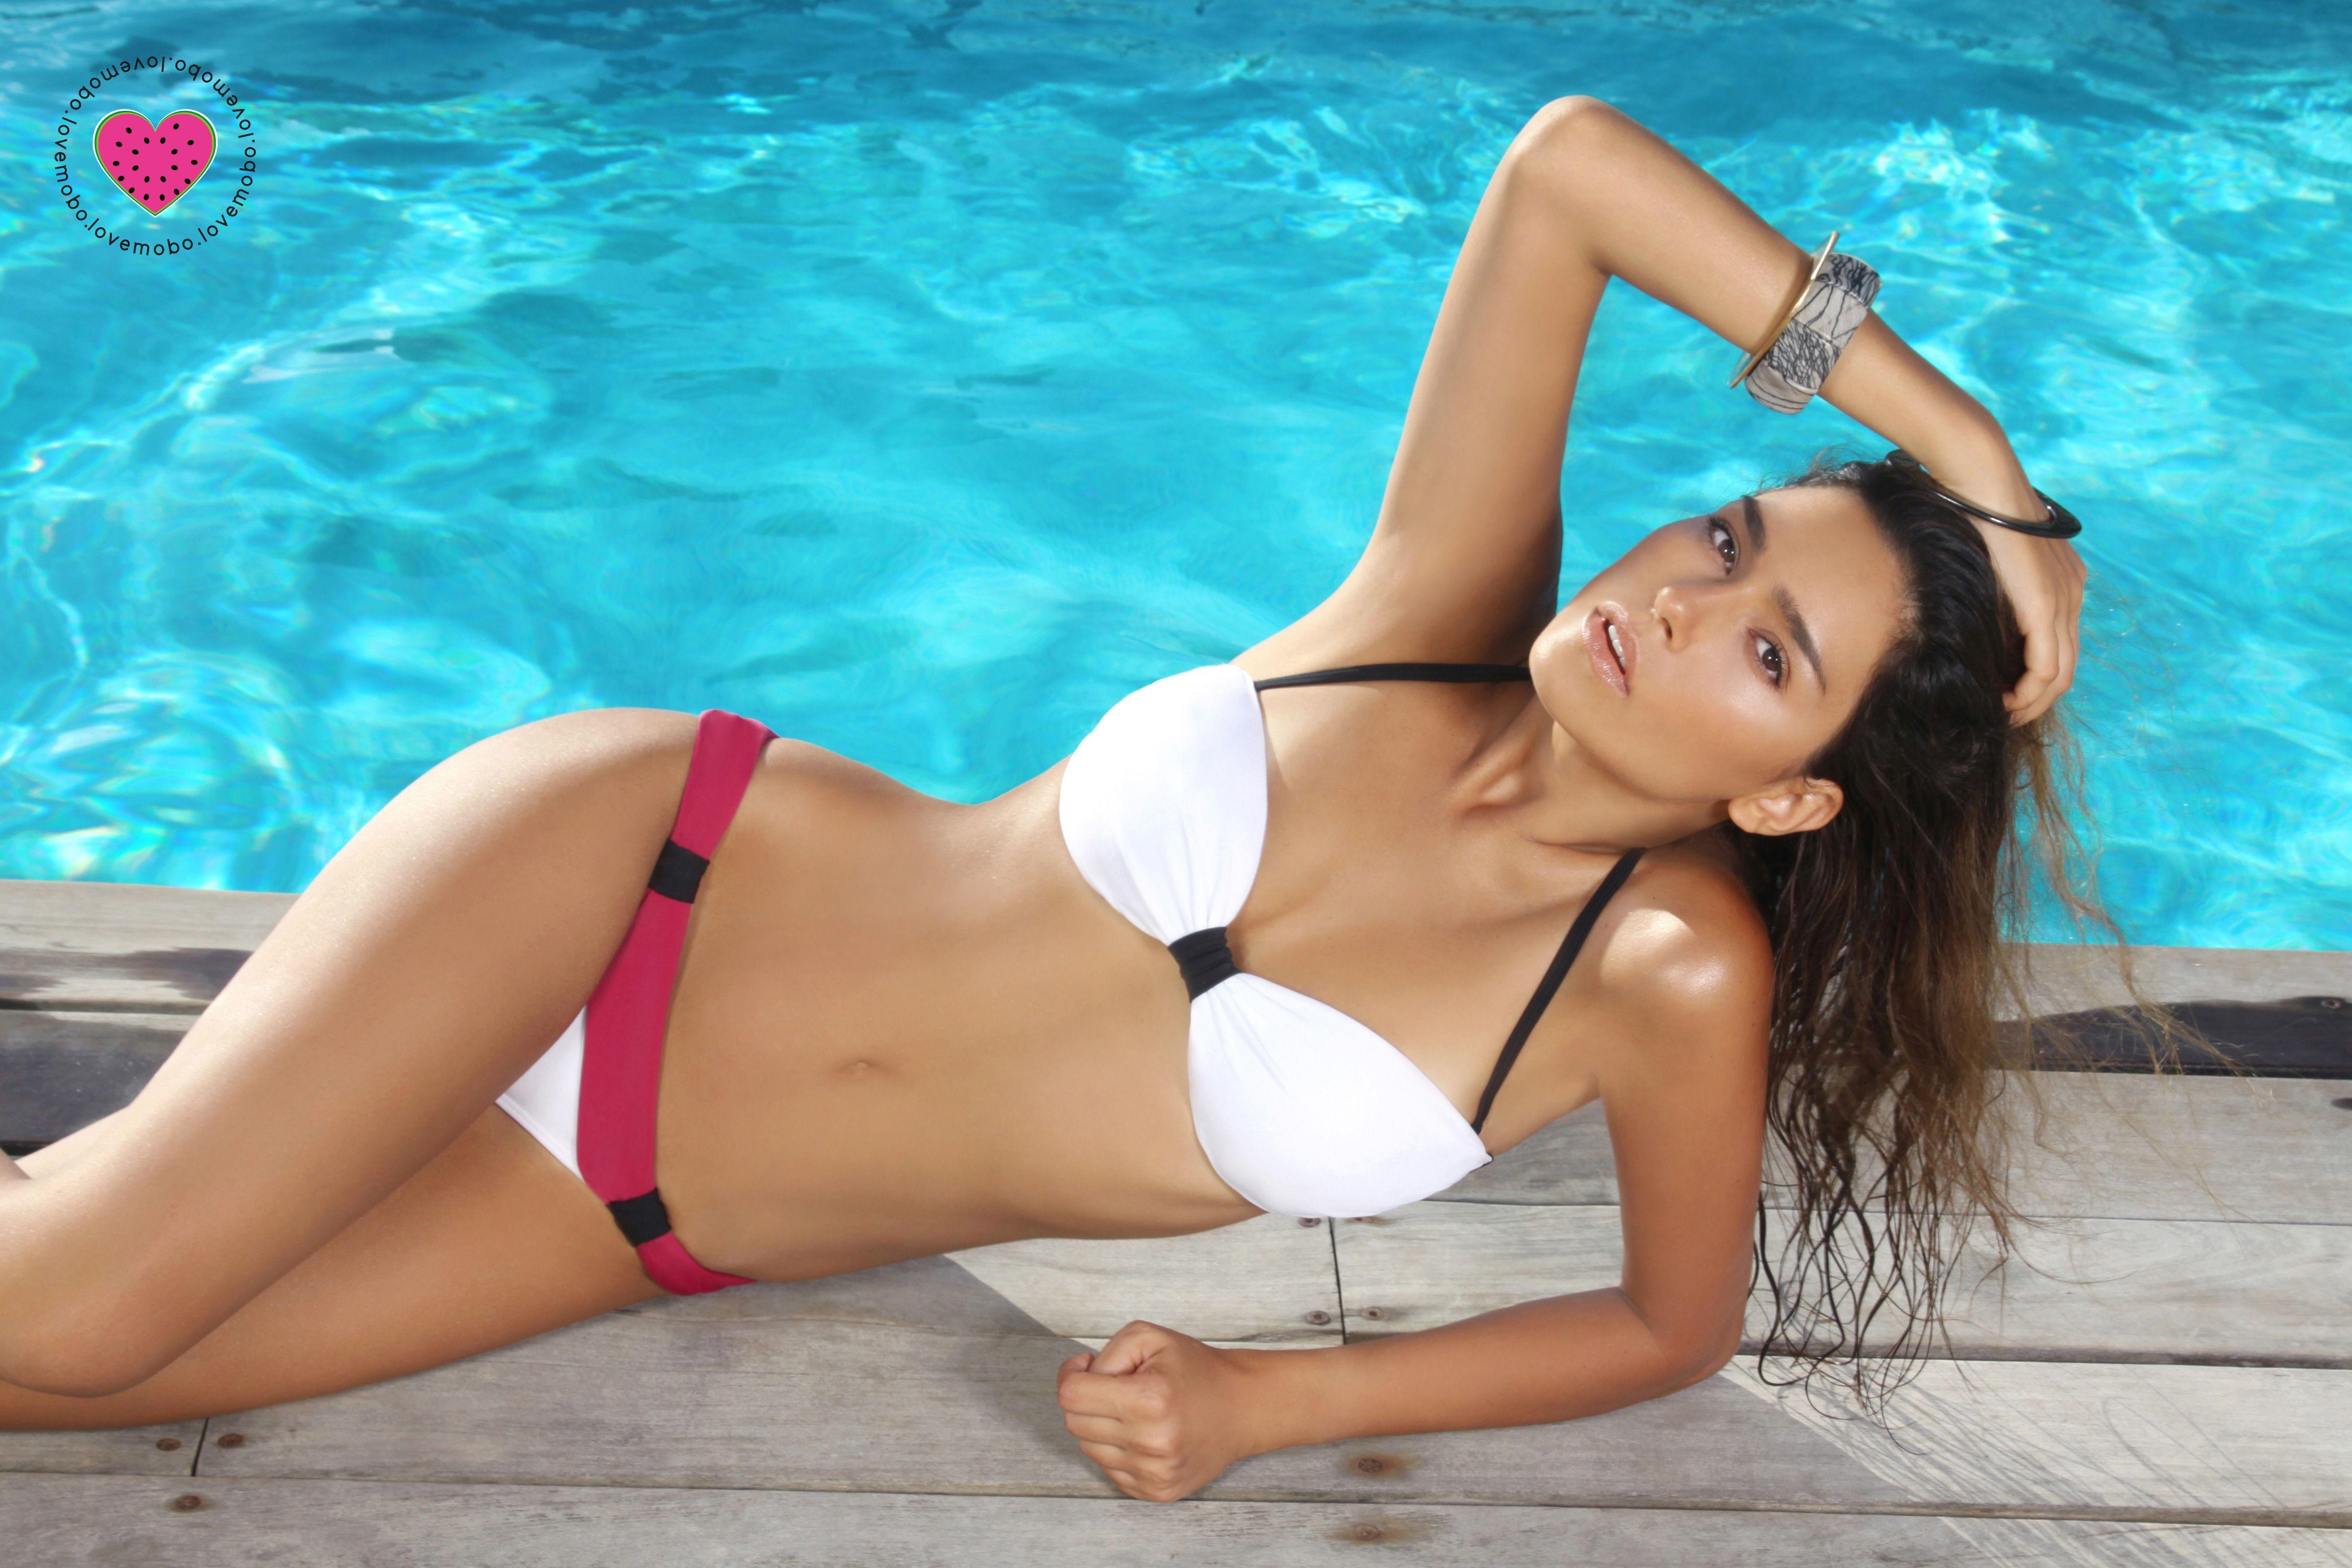 5e355e6324 #beach #brasil #brazil #praia #bikini #swimwear #summer #summertime # swimsuit #bikinis #riodejaneiro #ipanema #copacabana #beachwear  #madeinbrasil #hot ...